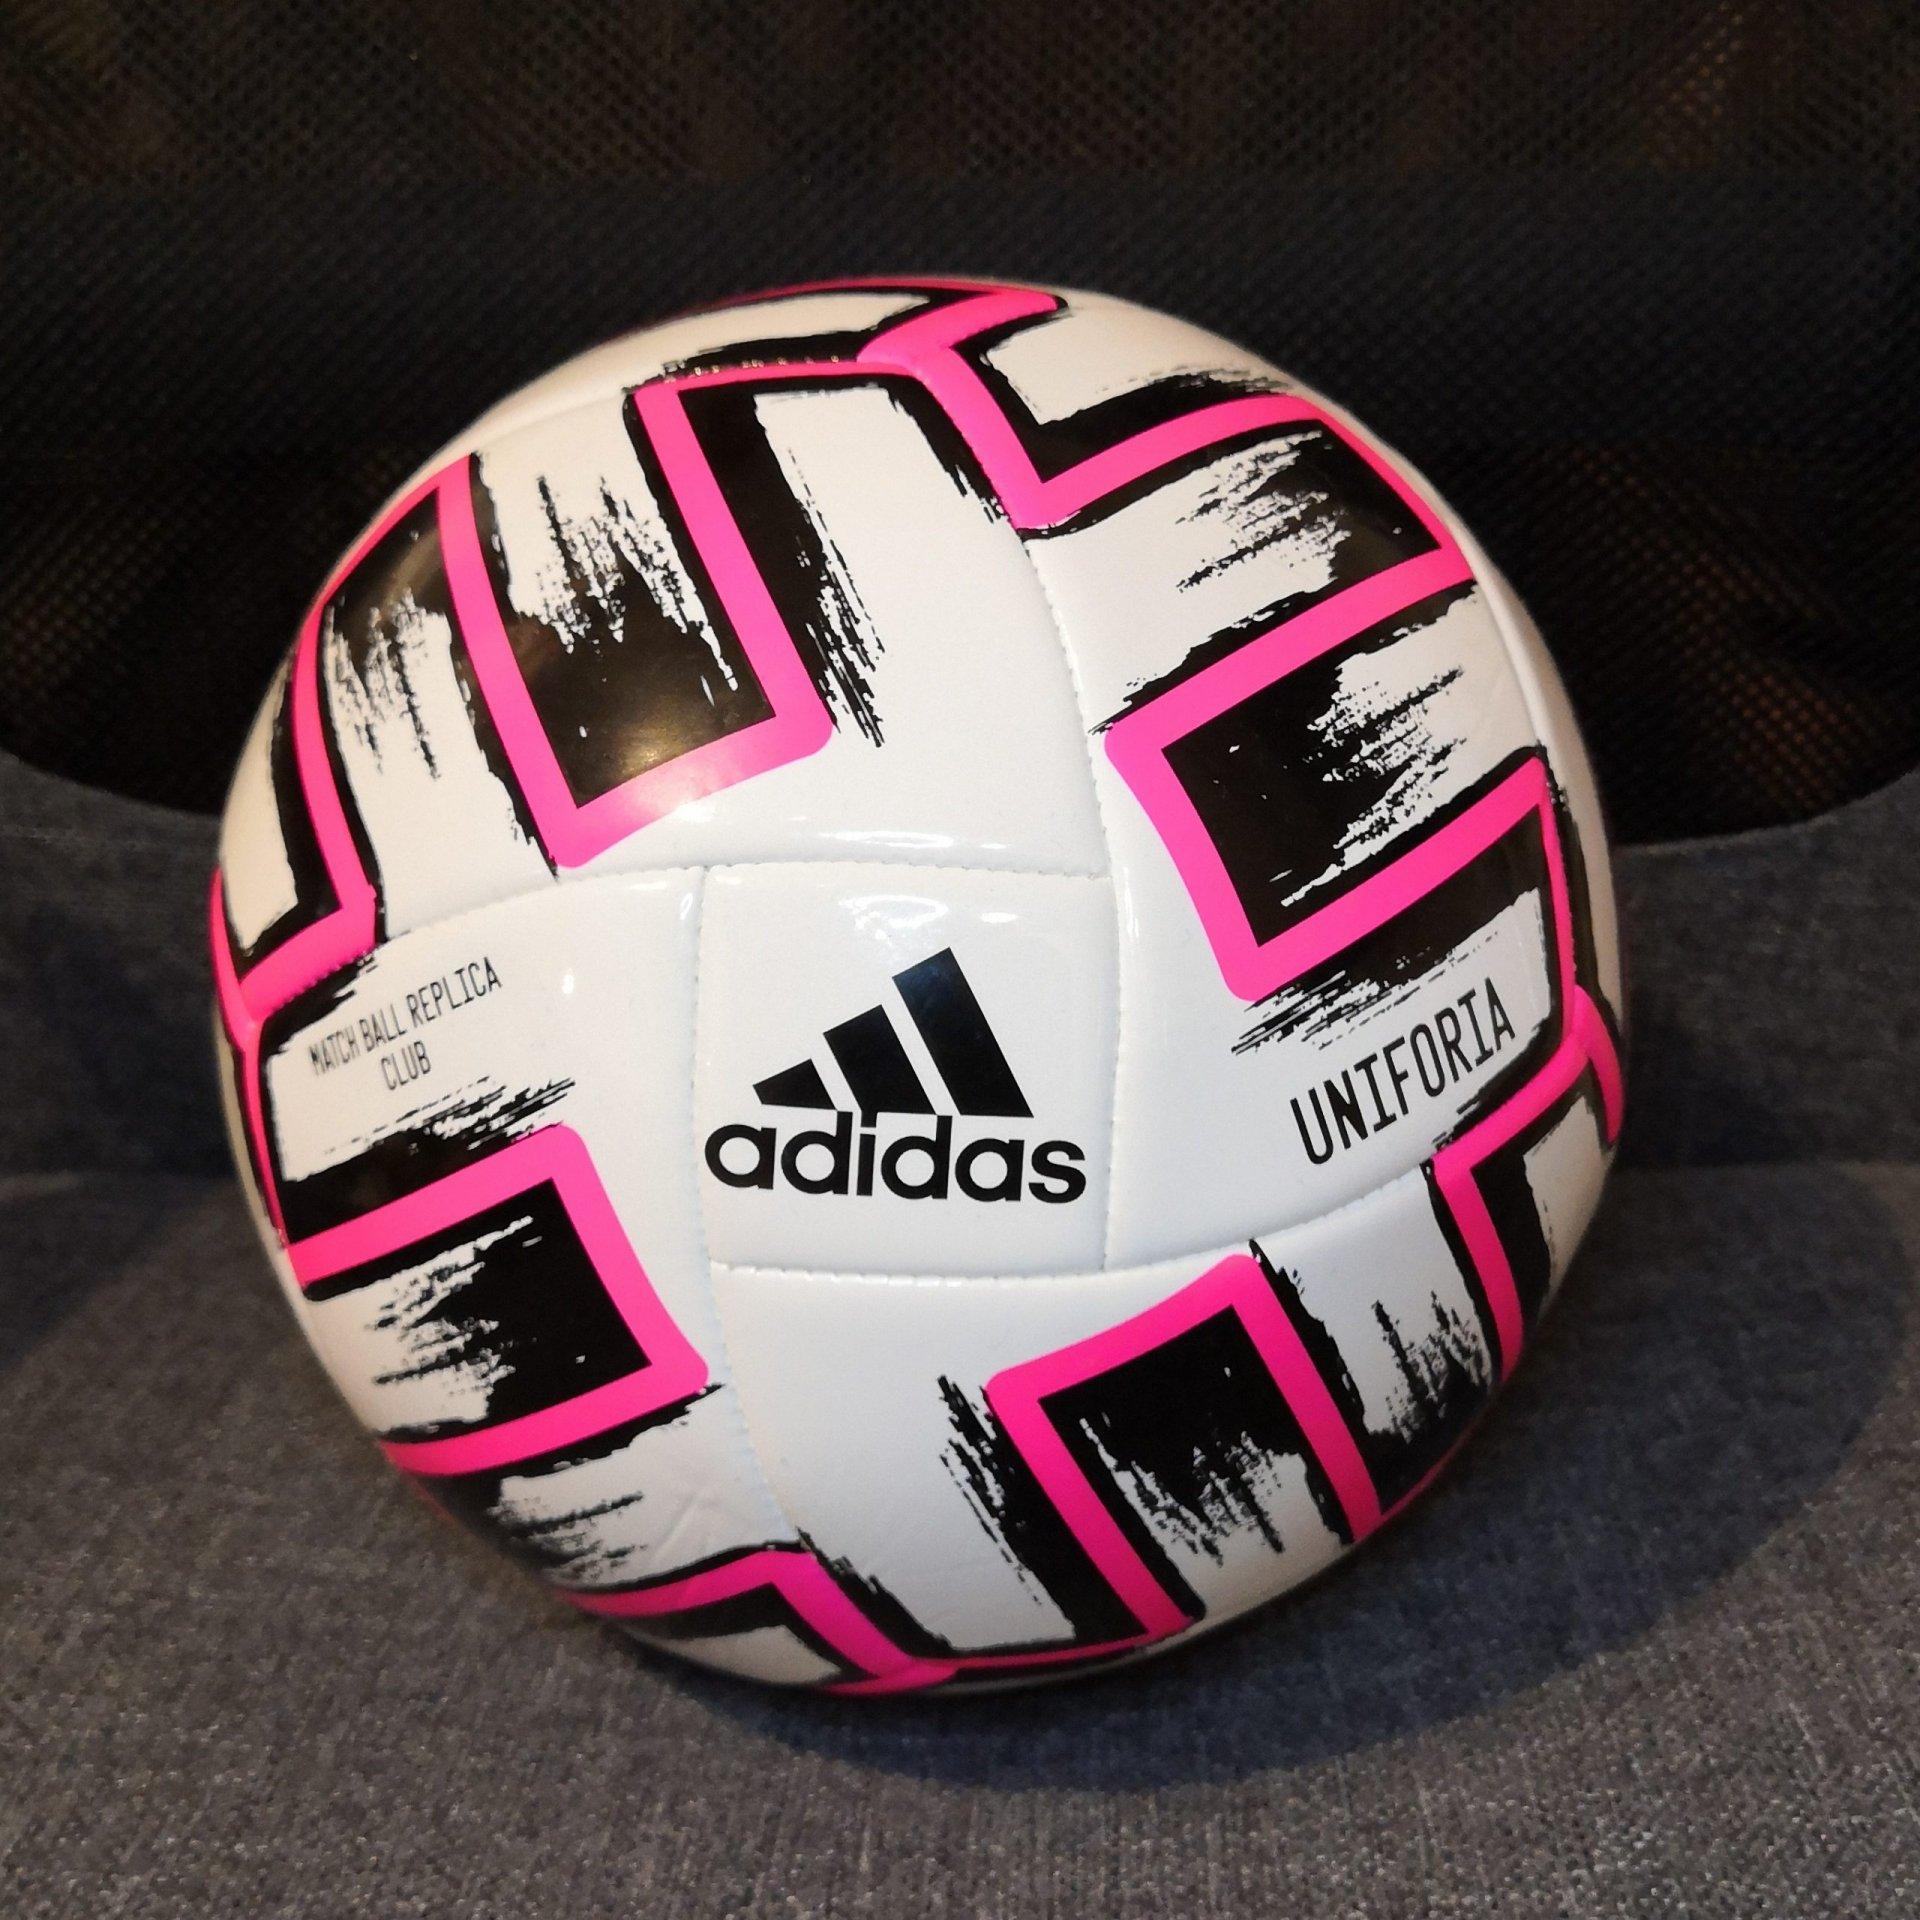 Adidas Uniforia 2020 Club